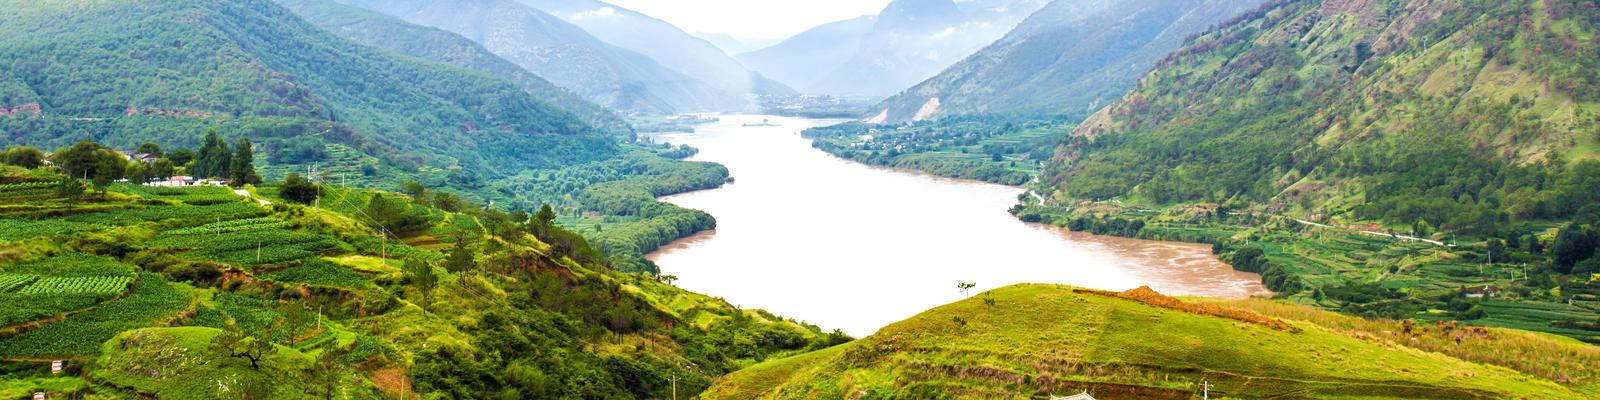 Yangtze River, Shangri-la (Photo: Pawika Tongtavee/Shutterstock)